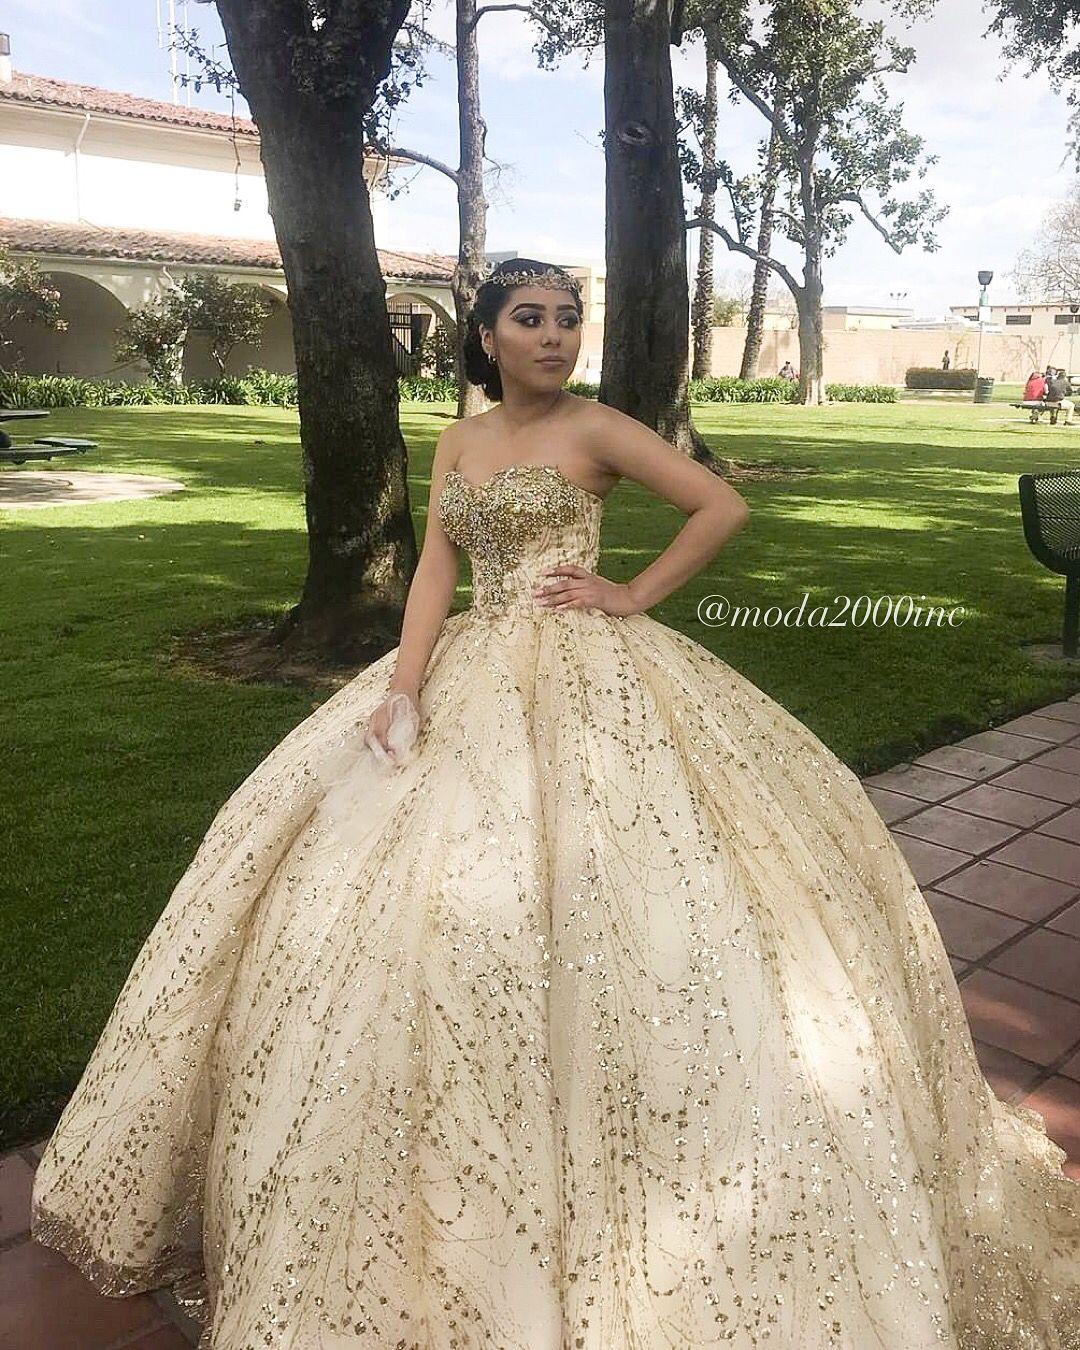 Glitter Gold Quinceanera Dress Quinceanera Dresses Gold Quinceanera Dresses Quince Dresses Mexican [ 1350 x 1080 Pixel ]